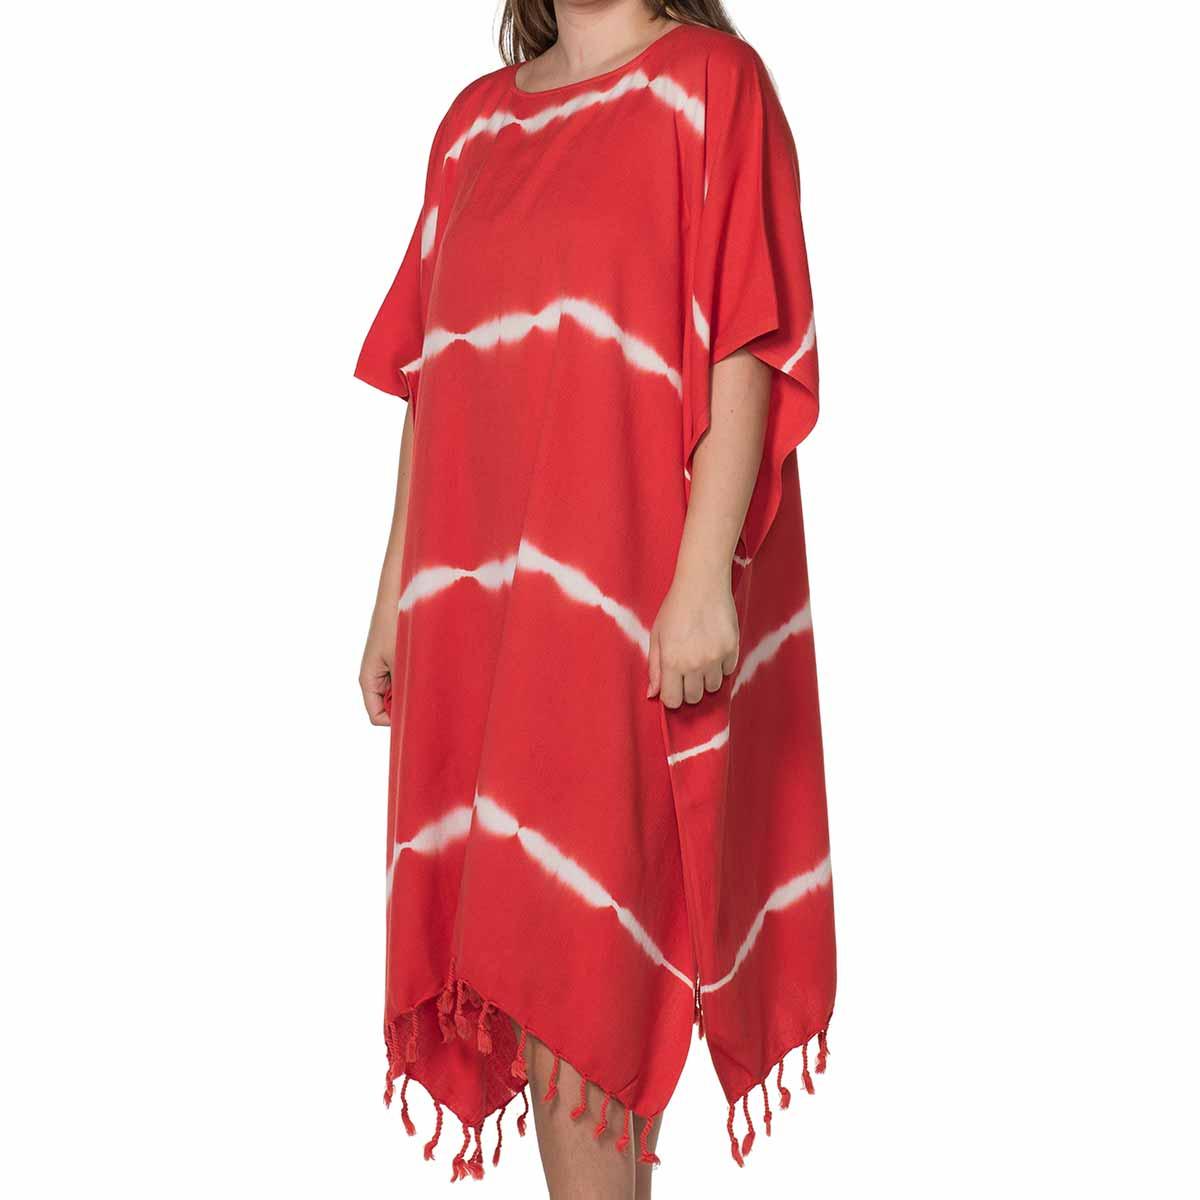 Tunic Daisy / Tie Dye - Base Red